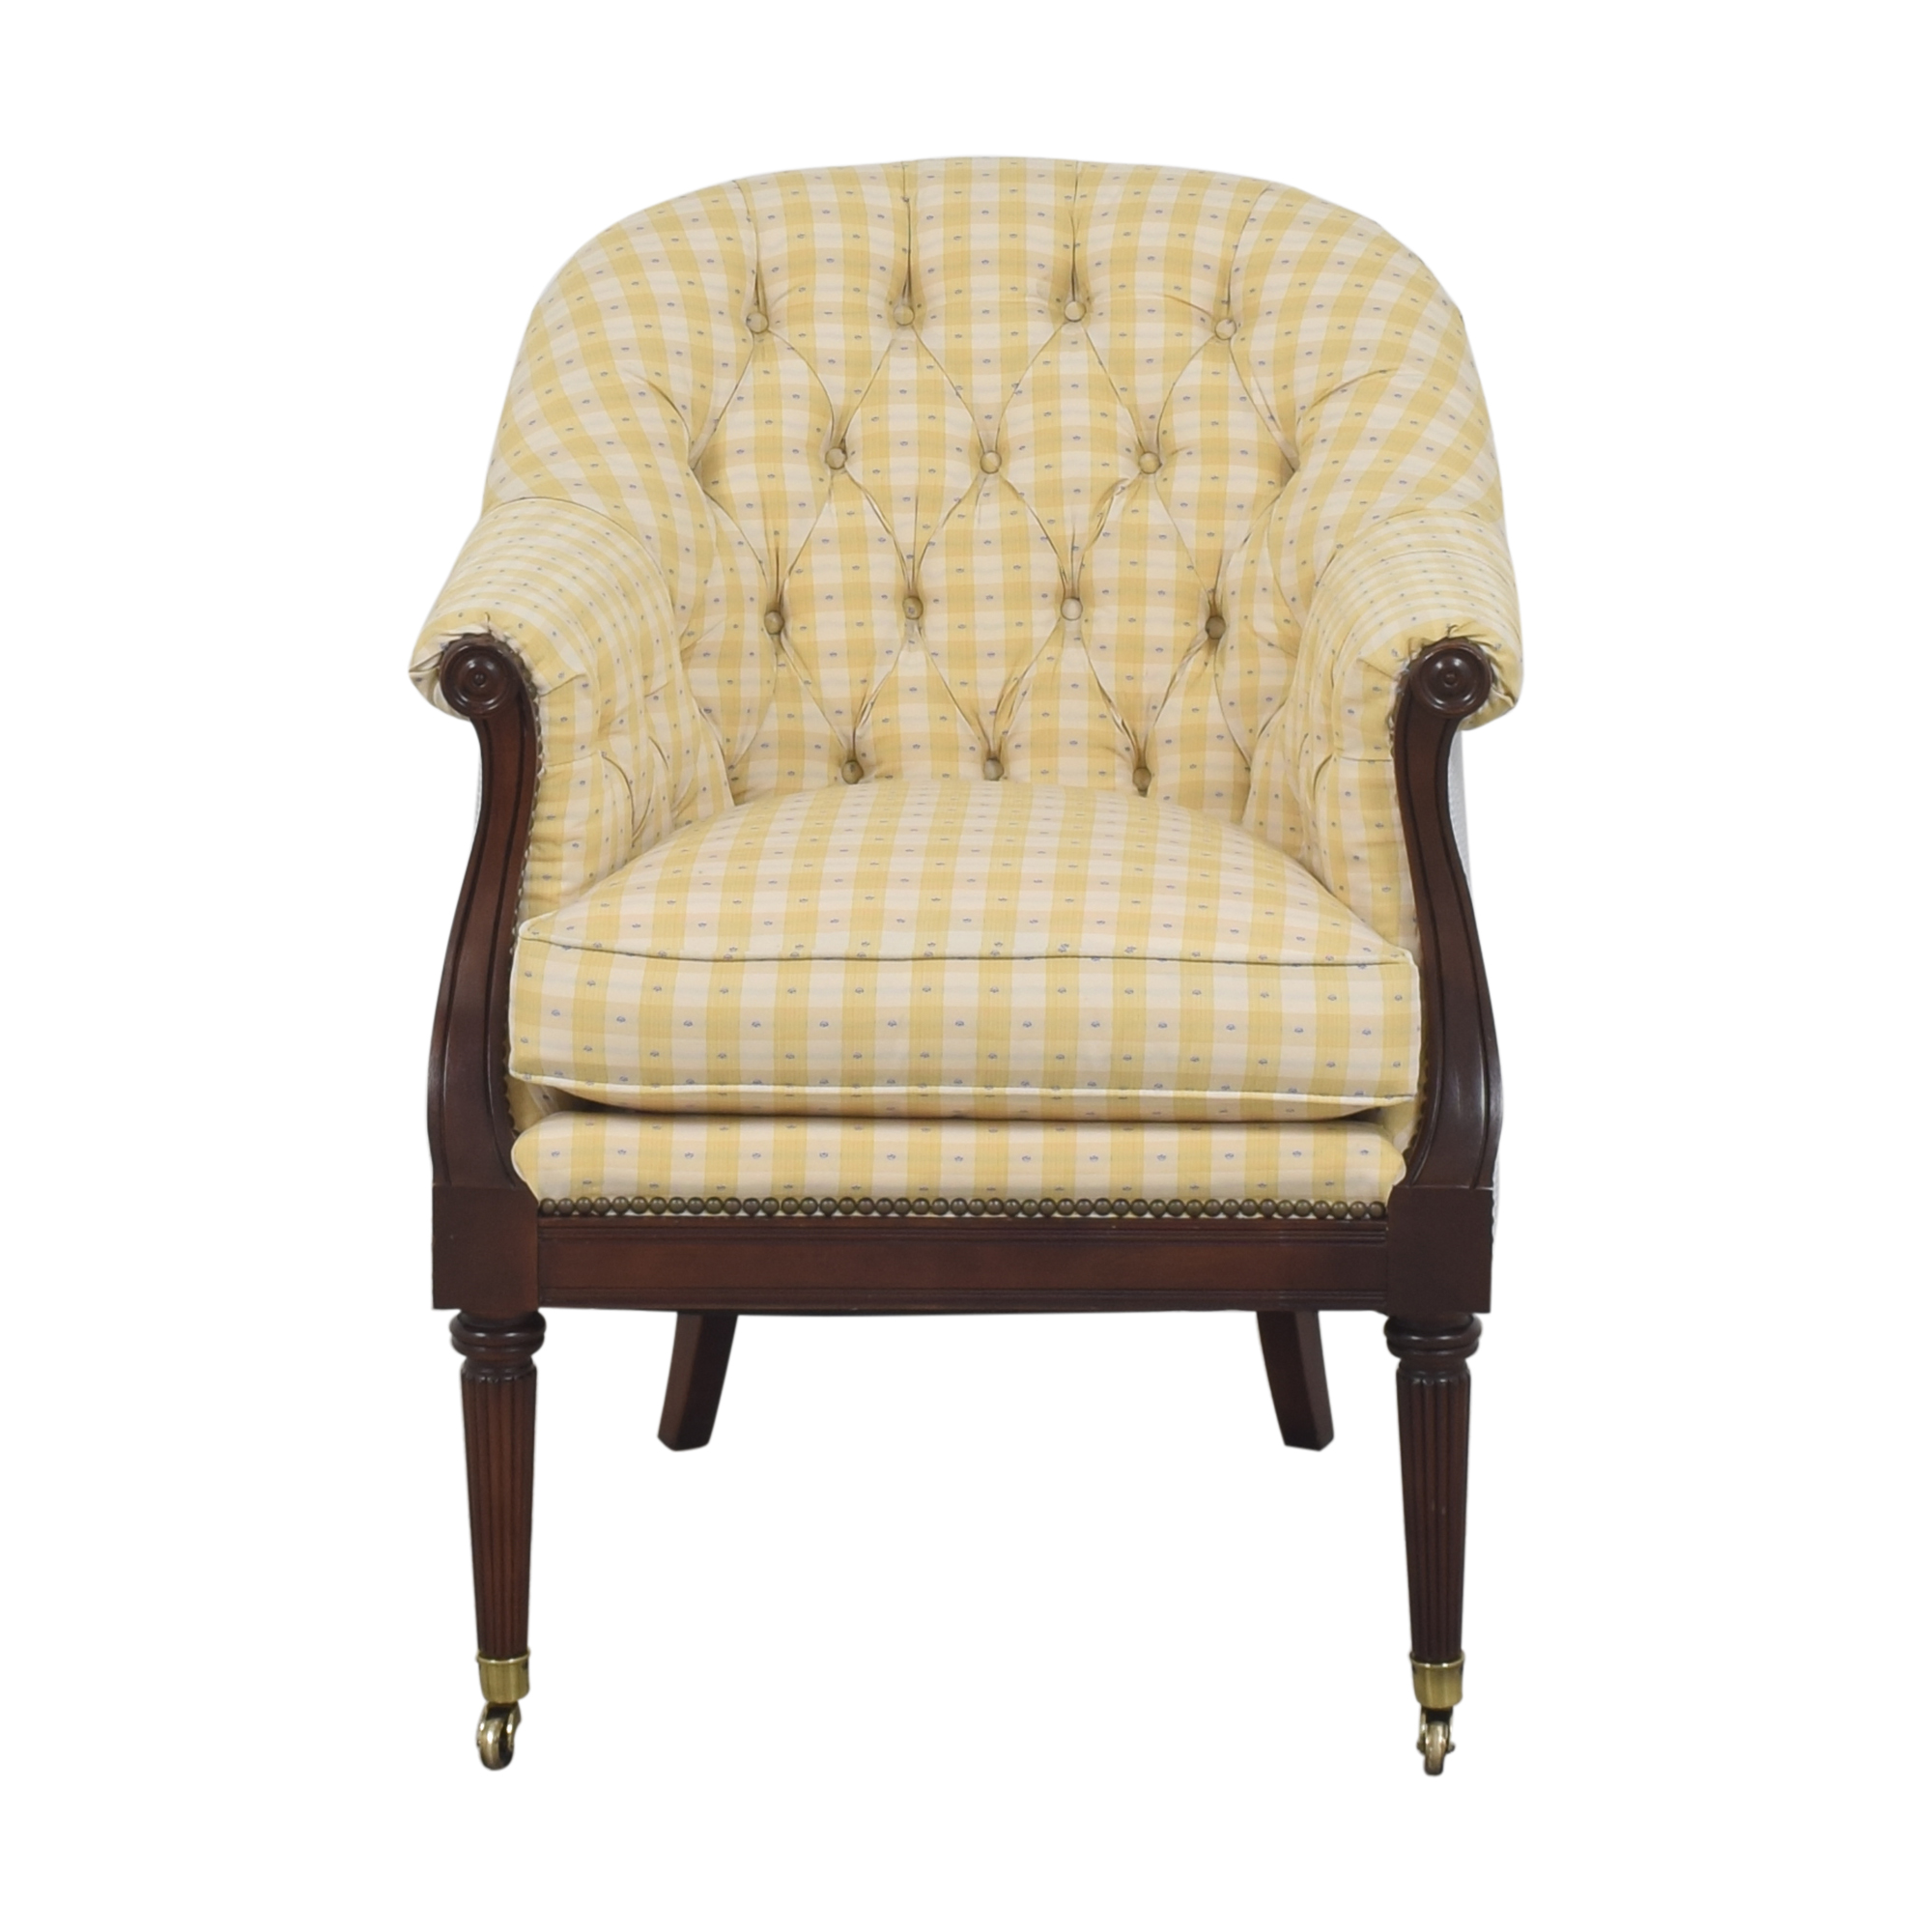 Lillian August Tufted Arm Chair sale